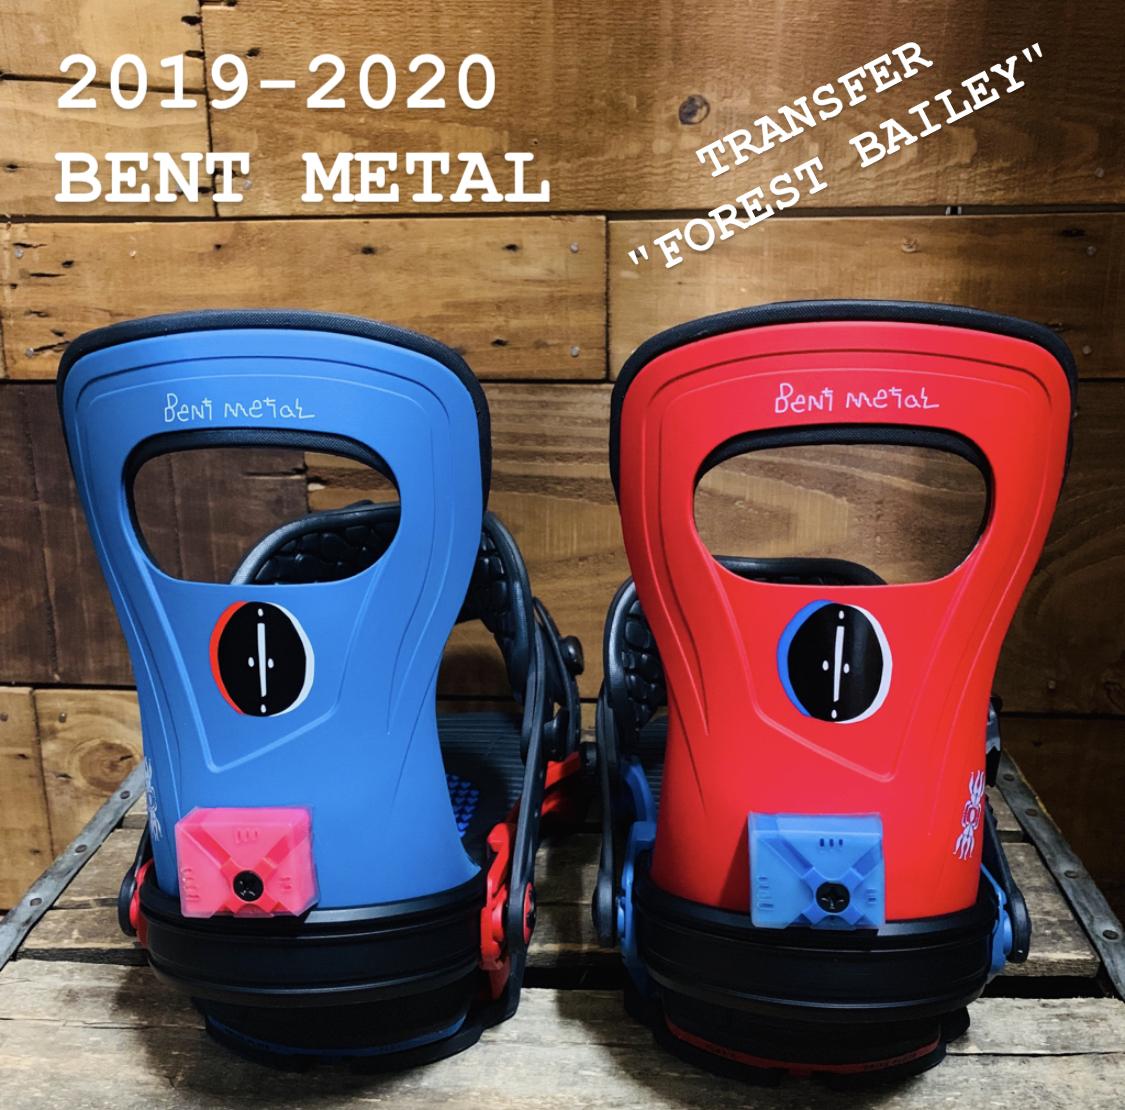 BENT METAL _商品02_ビンディング_TRANSFER